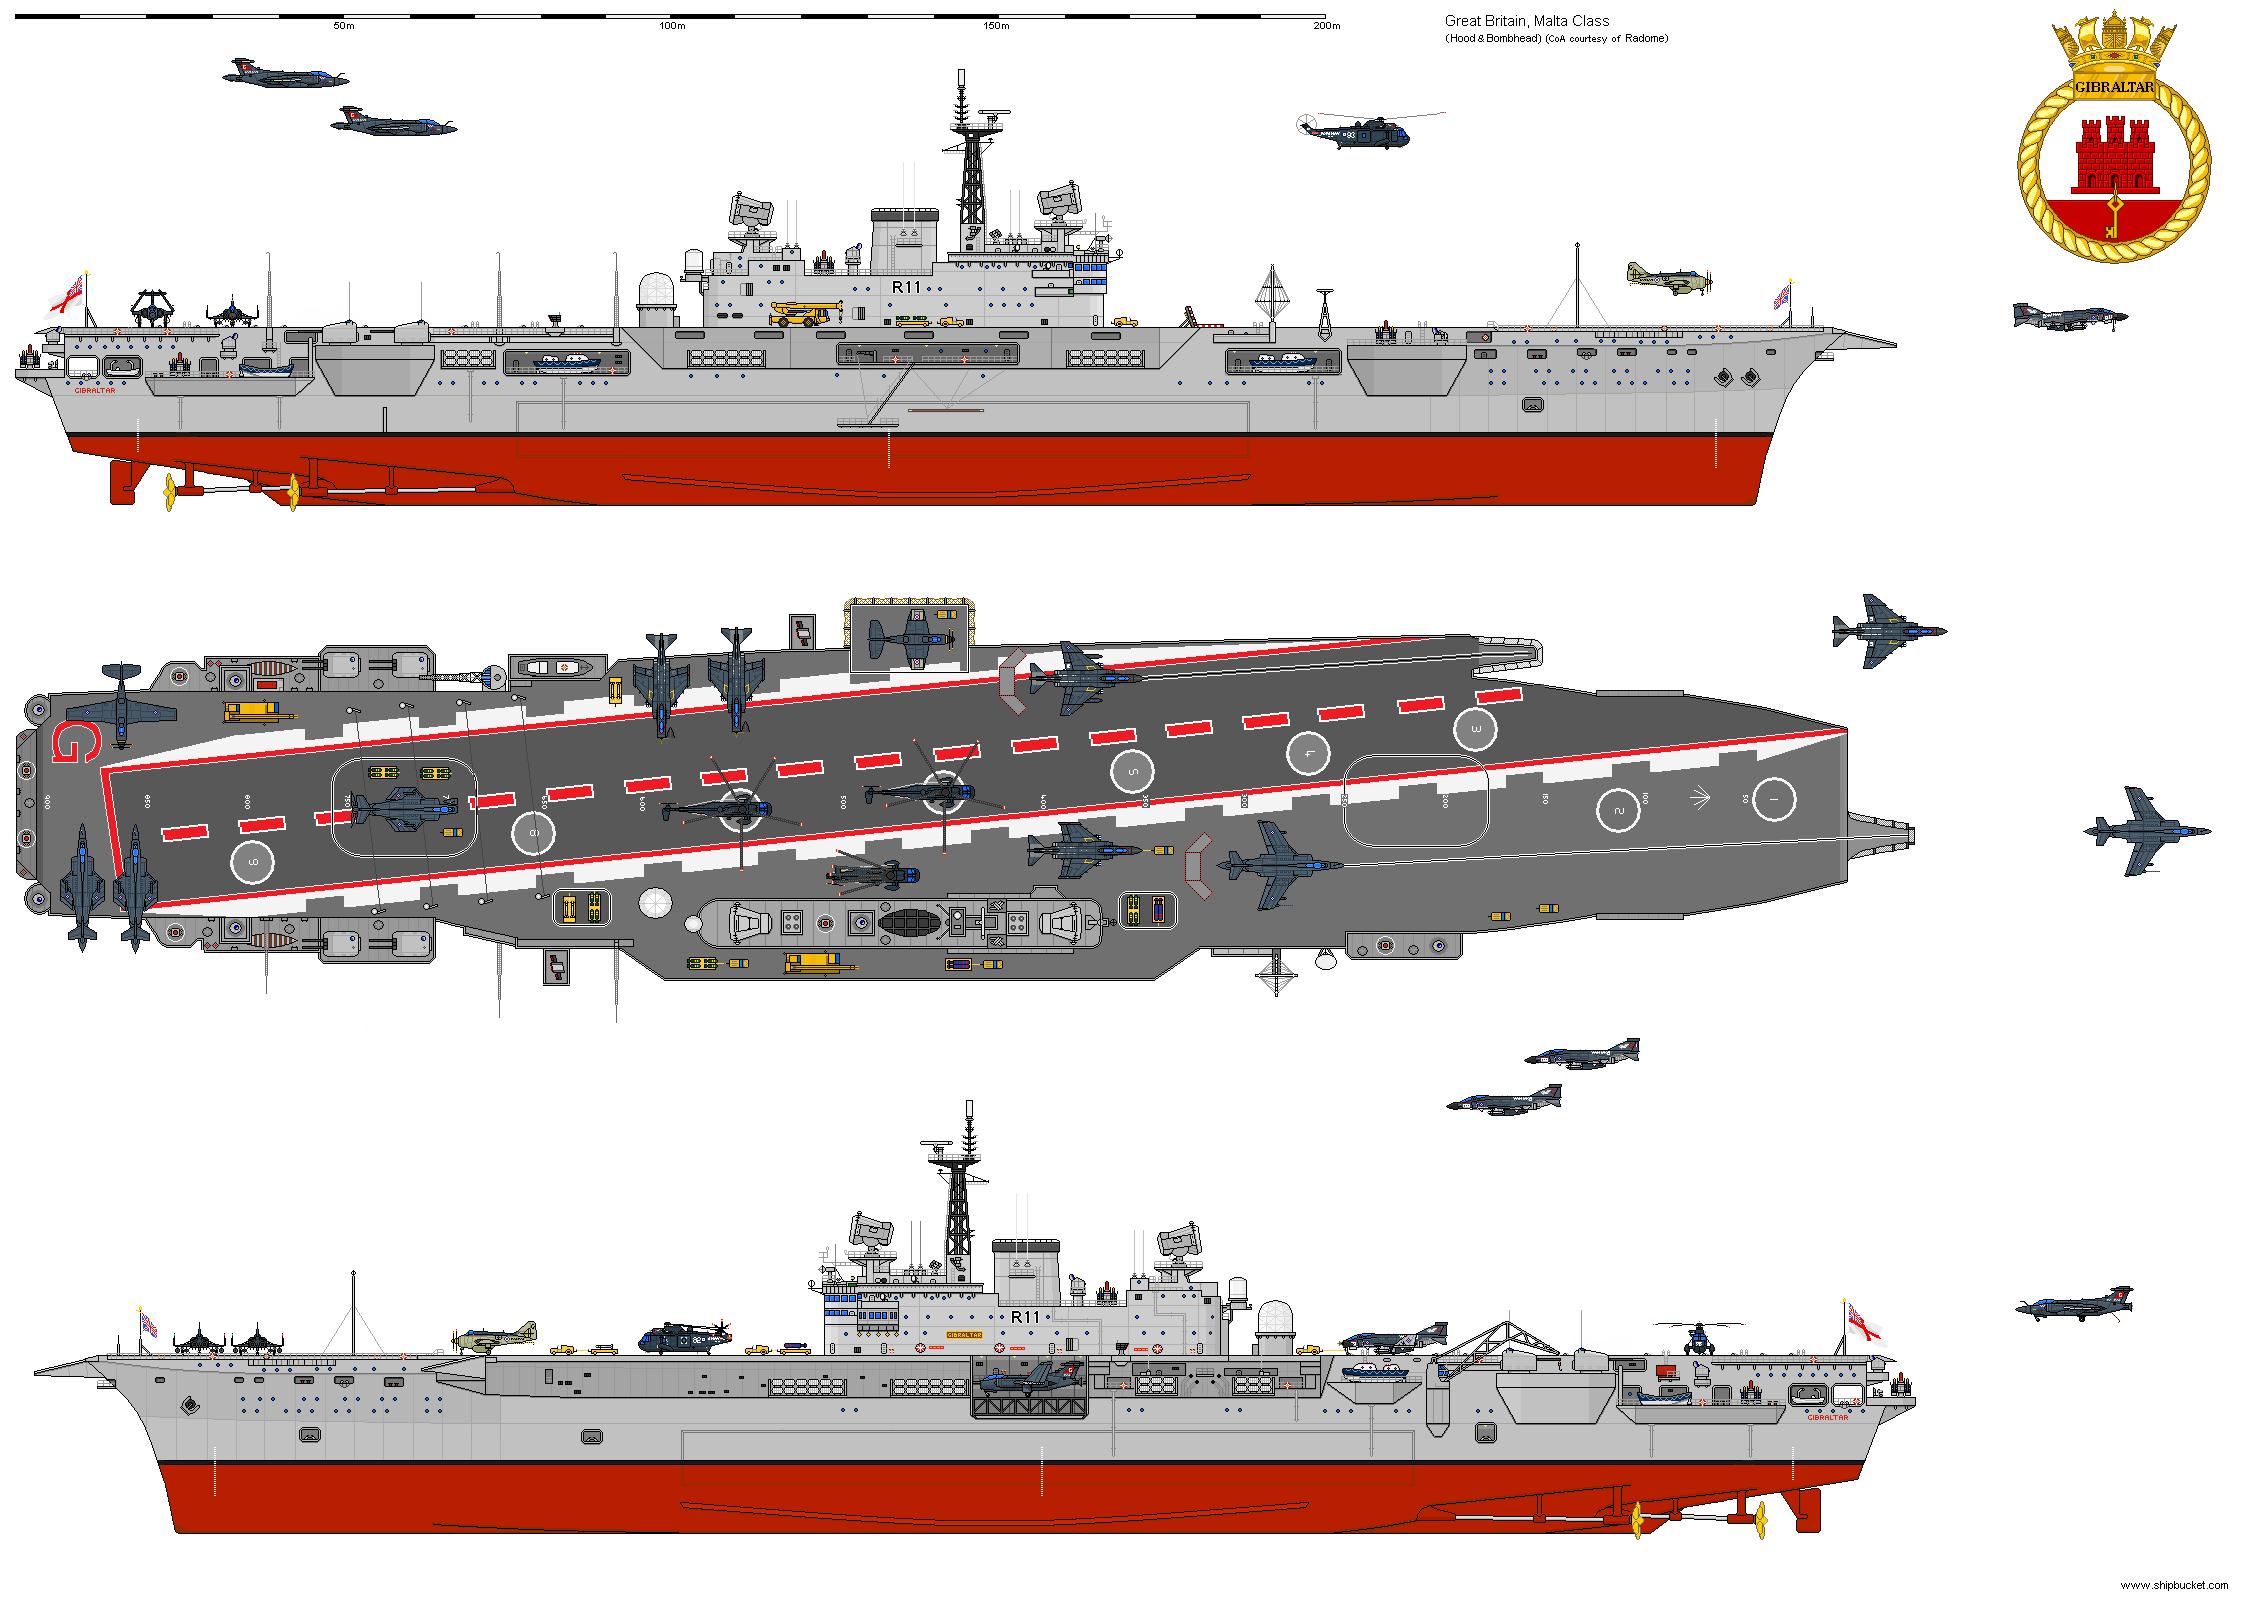 Shipbucket Never Built Designs Great Britain Cv R11 Gibraltar Png Aircraft Carrier Royal Navy Aircraft Carriers Navy Aircraft Carrier